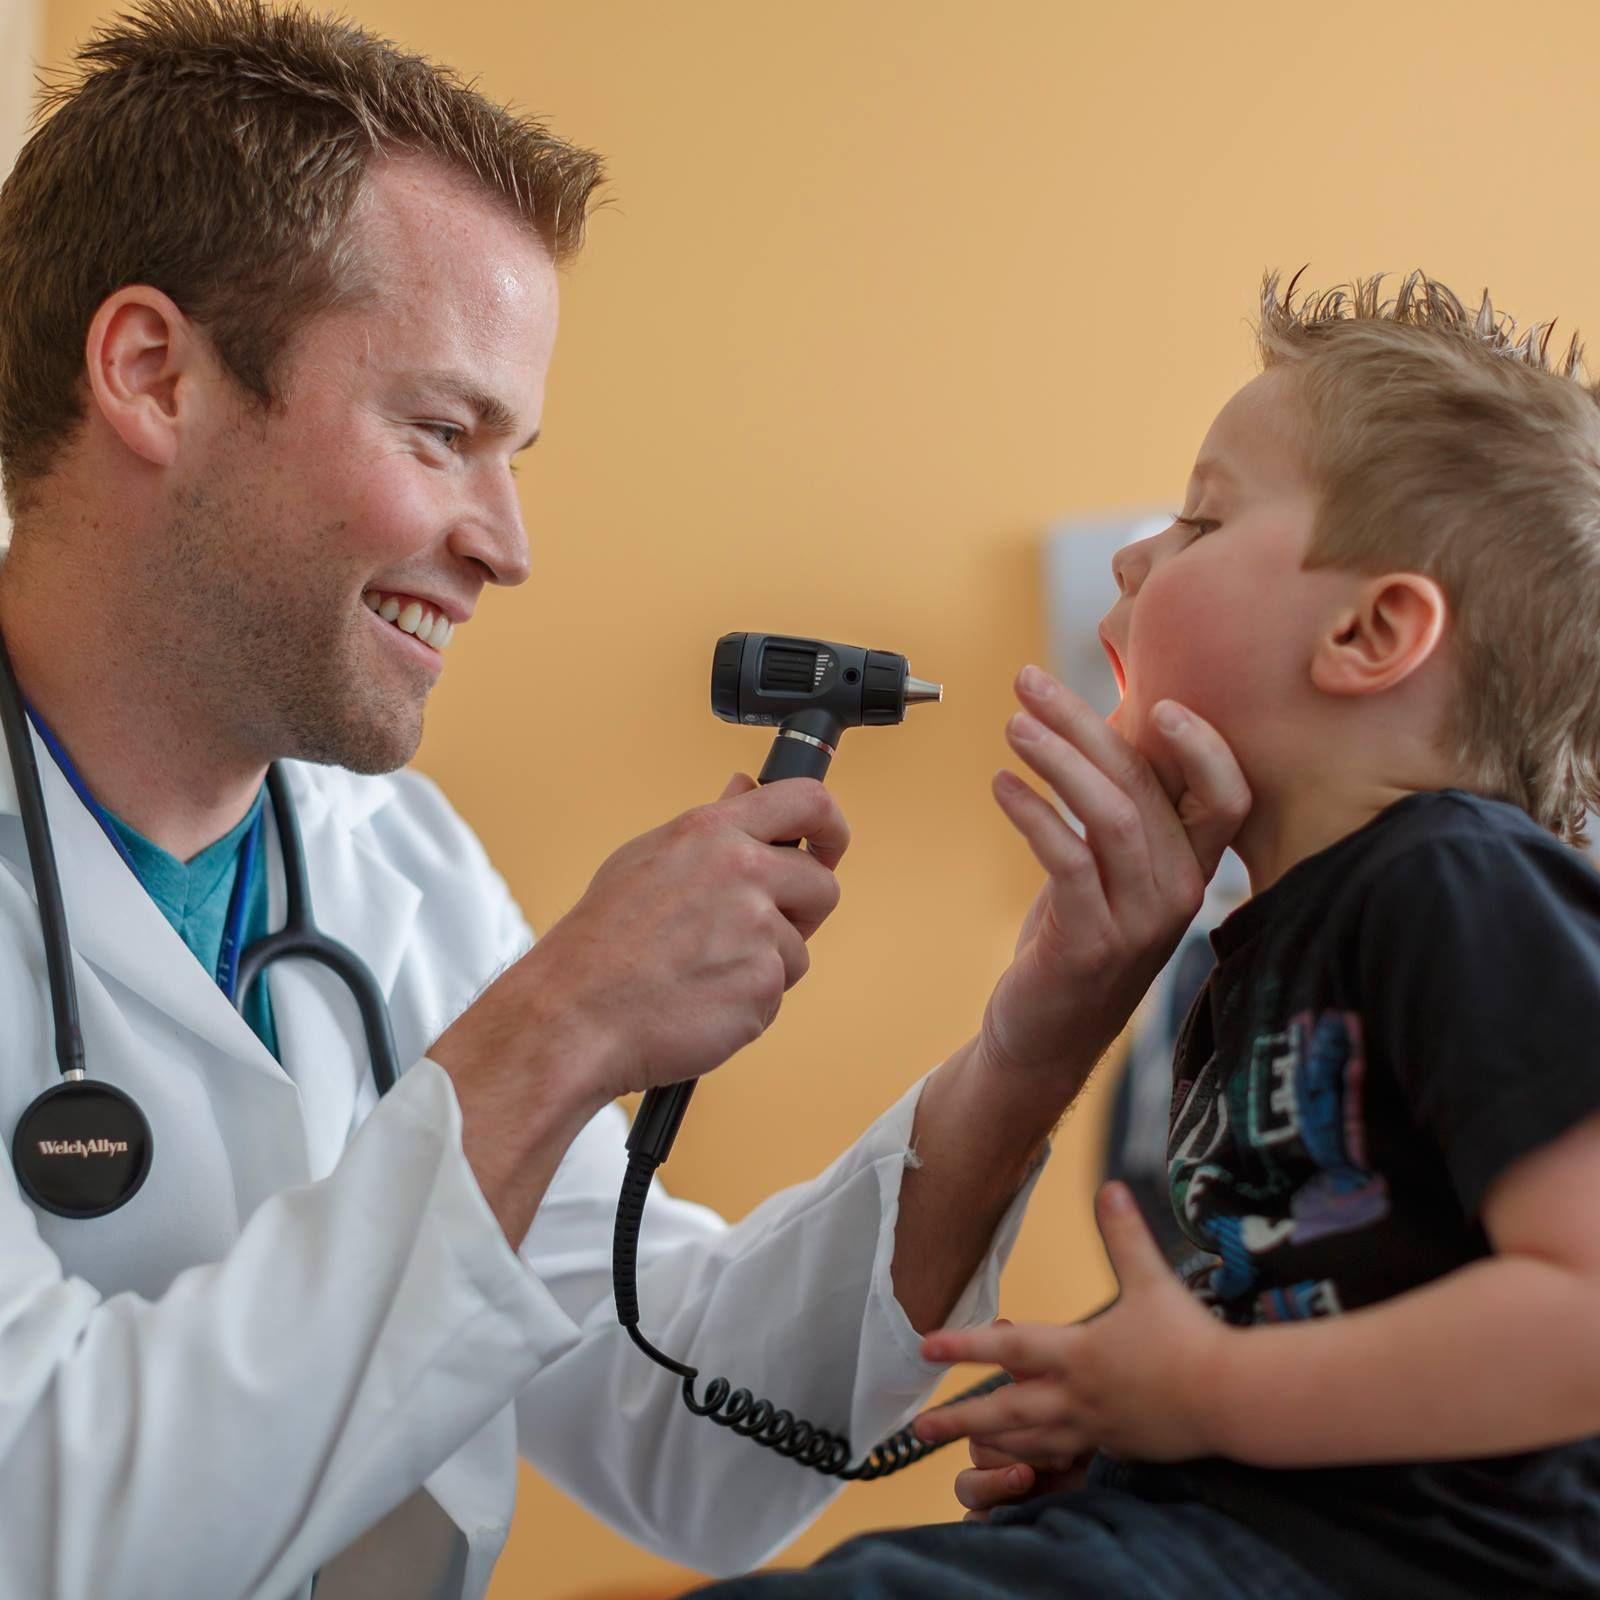 Diabetes primary children childrens hospital diabetes